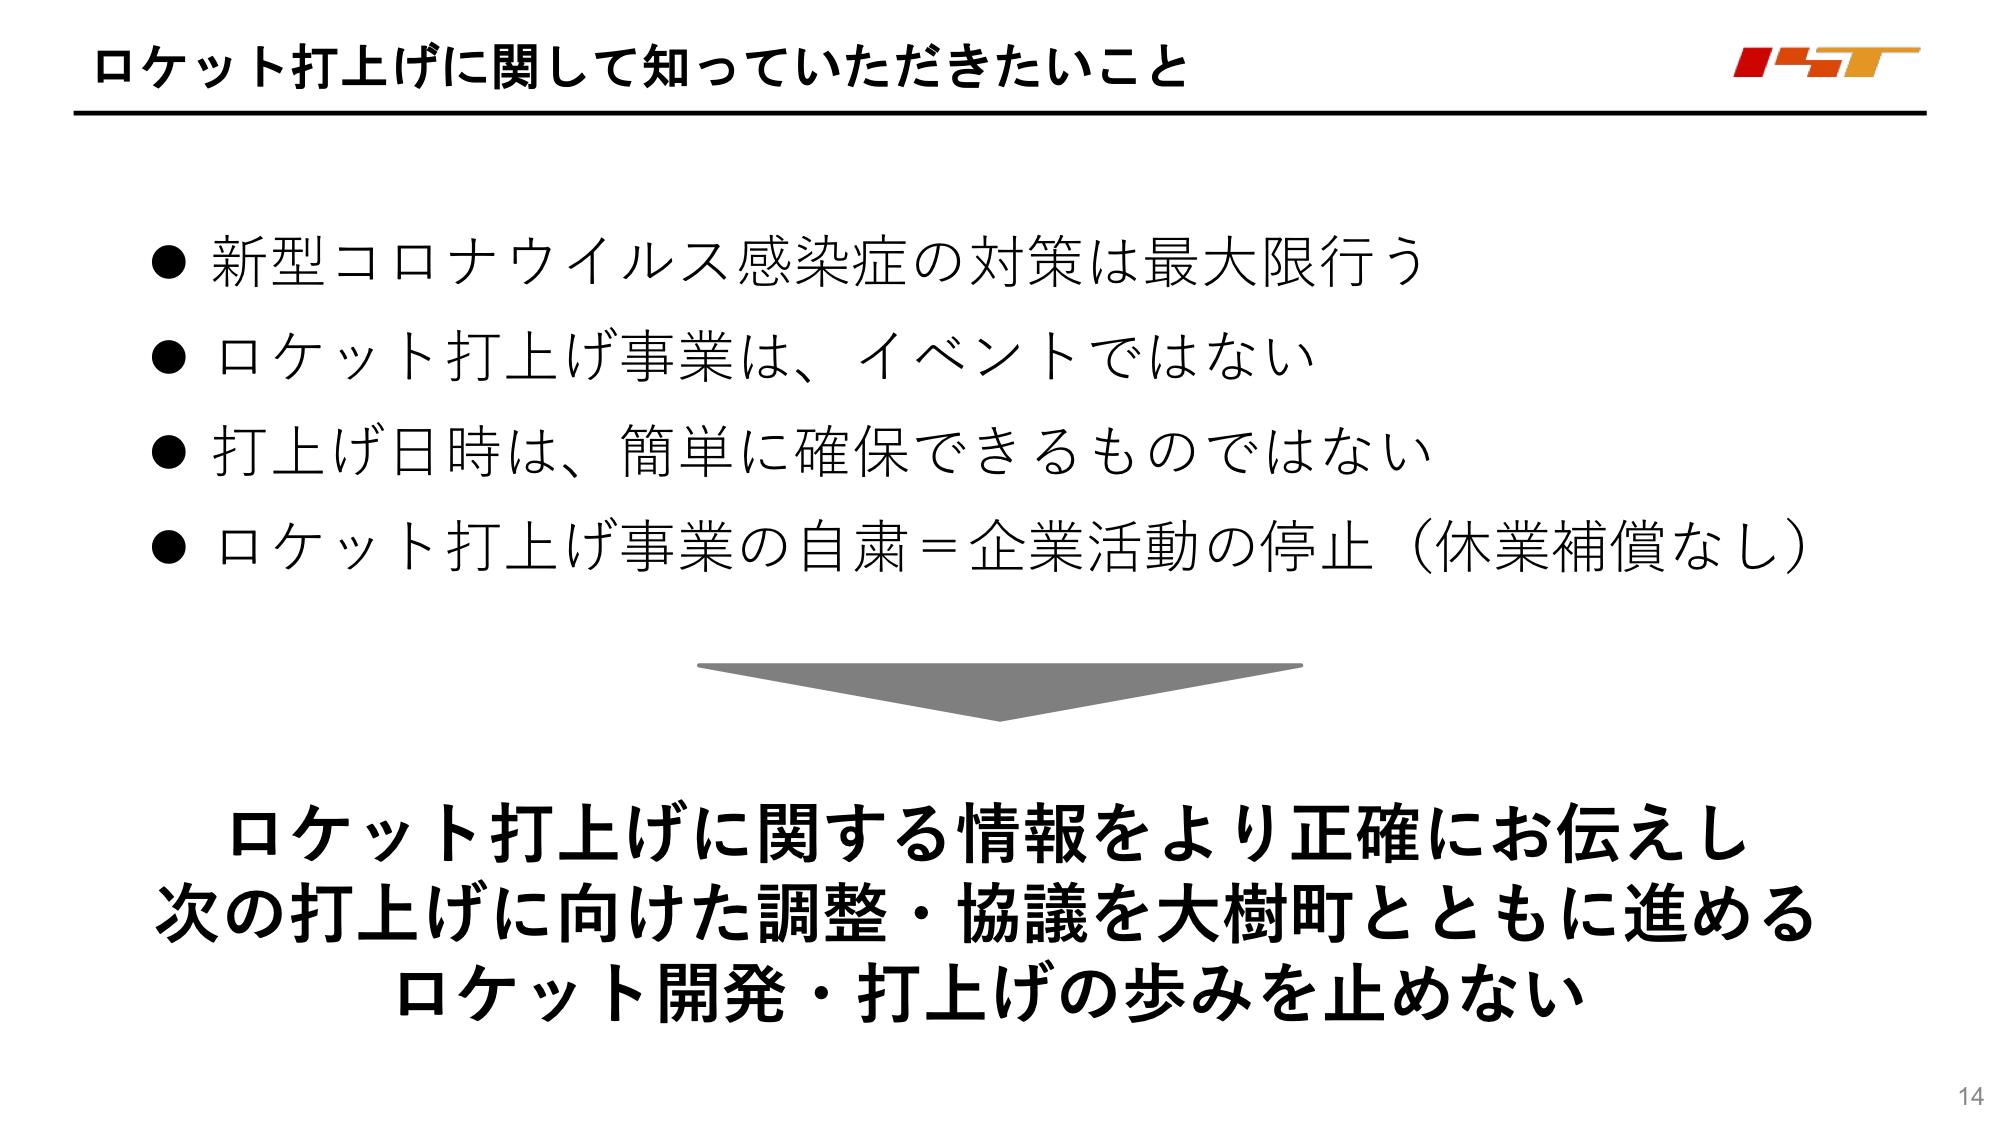 f:id:Imamura:20200603232828p:plain